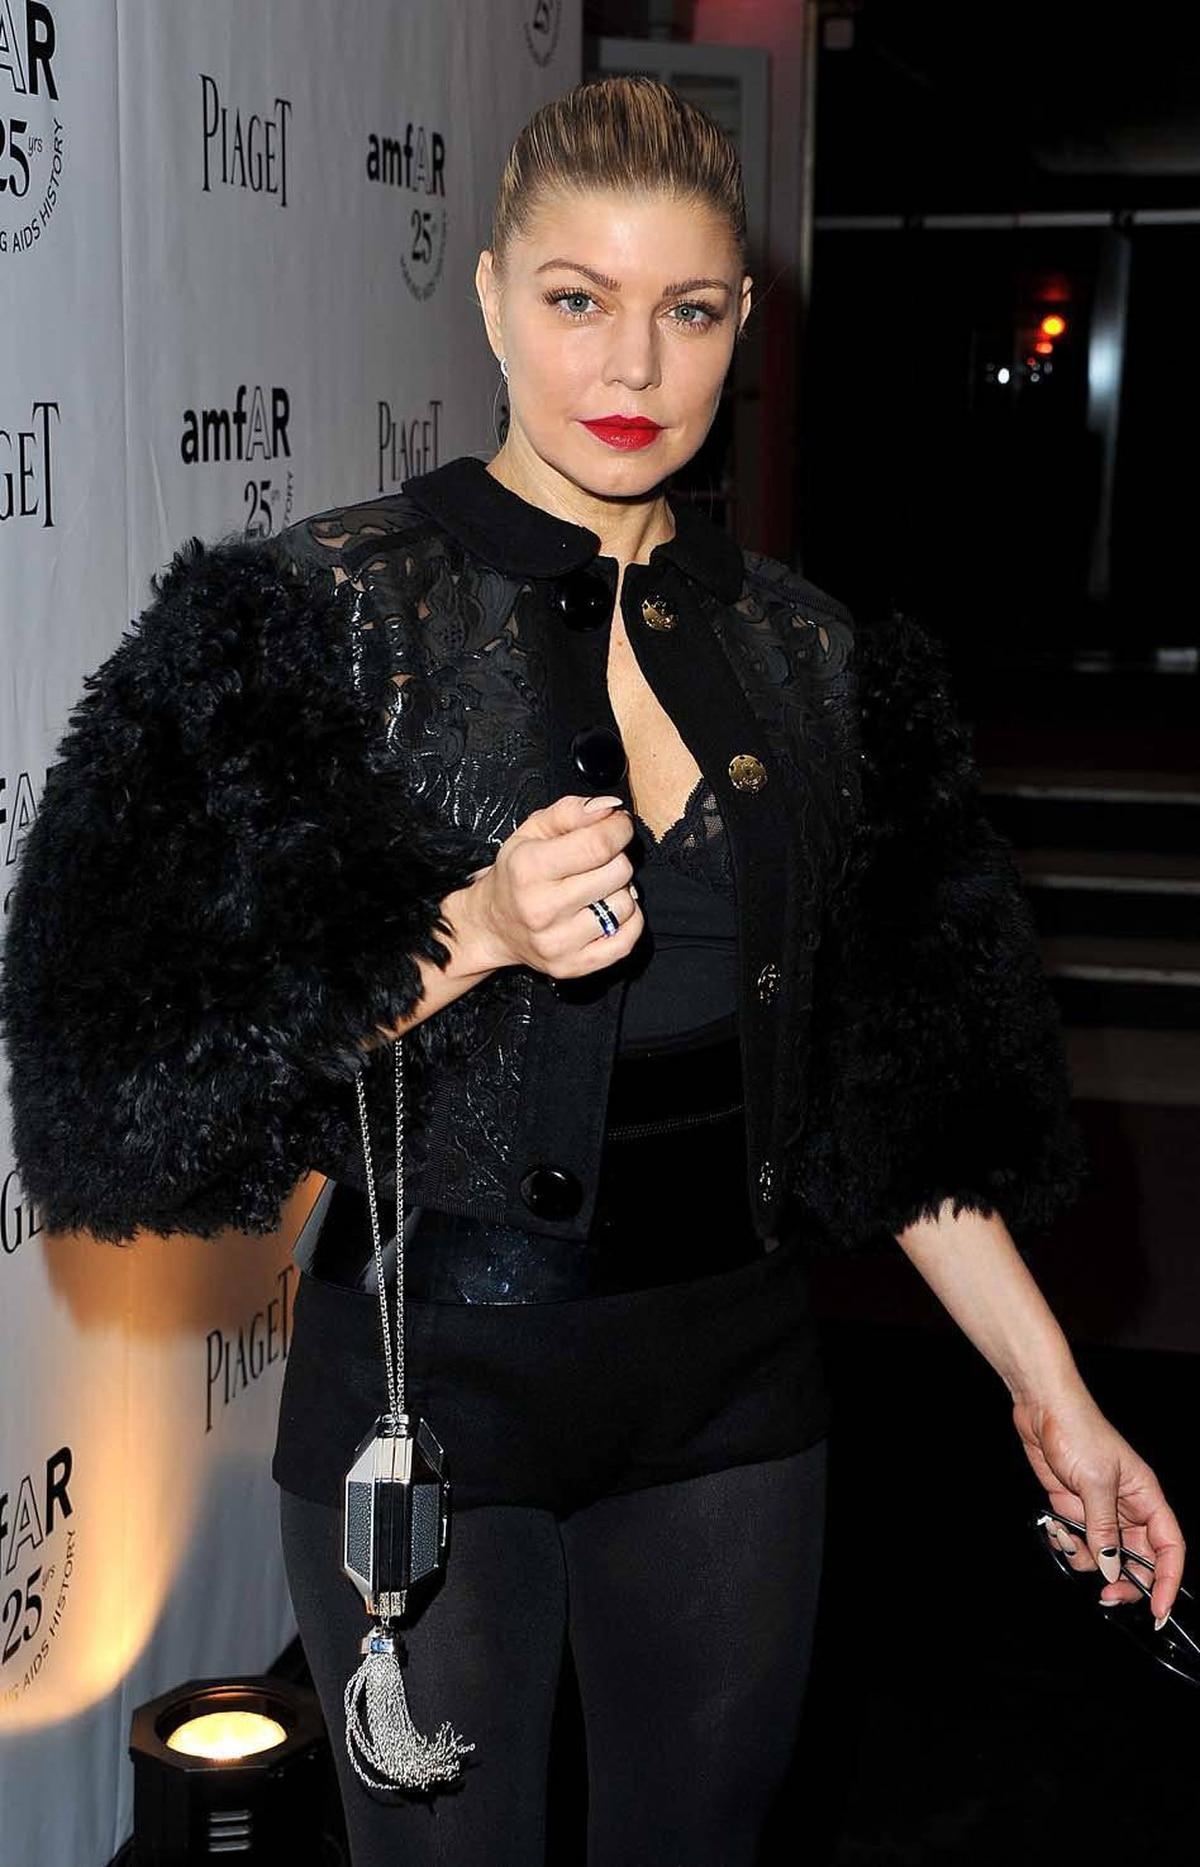 Fergie attends the amfAR Inspiration Gala at Pavillon Gabriel on June 23, 2011 in Paris, France.